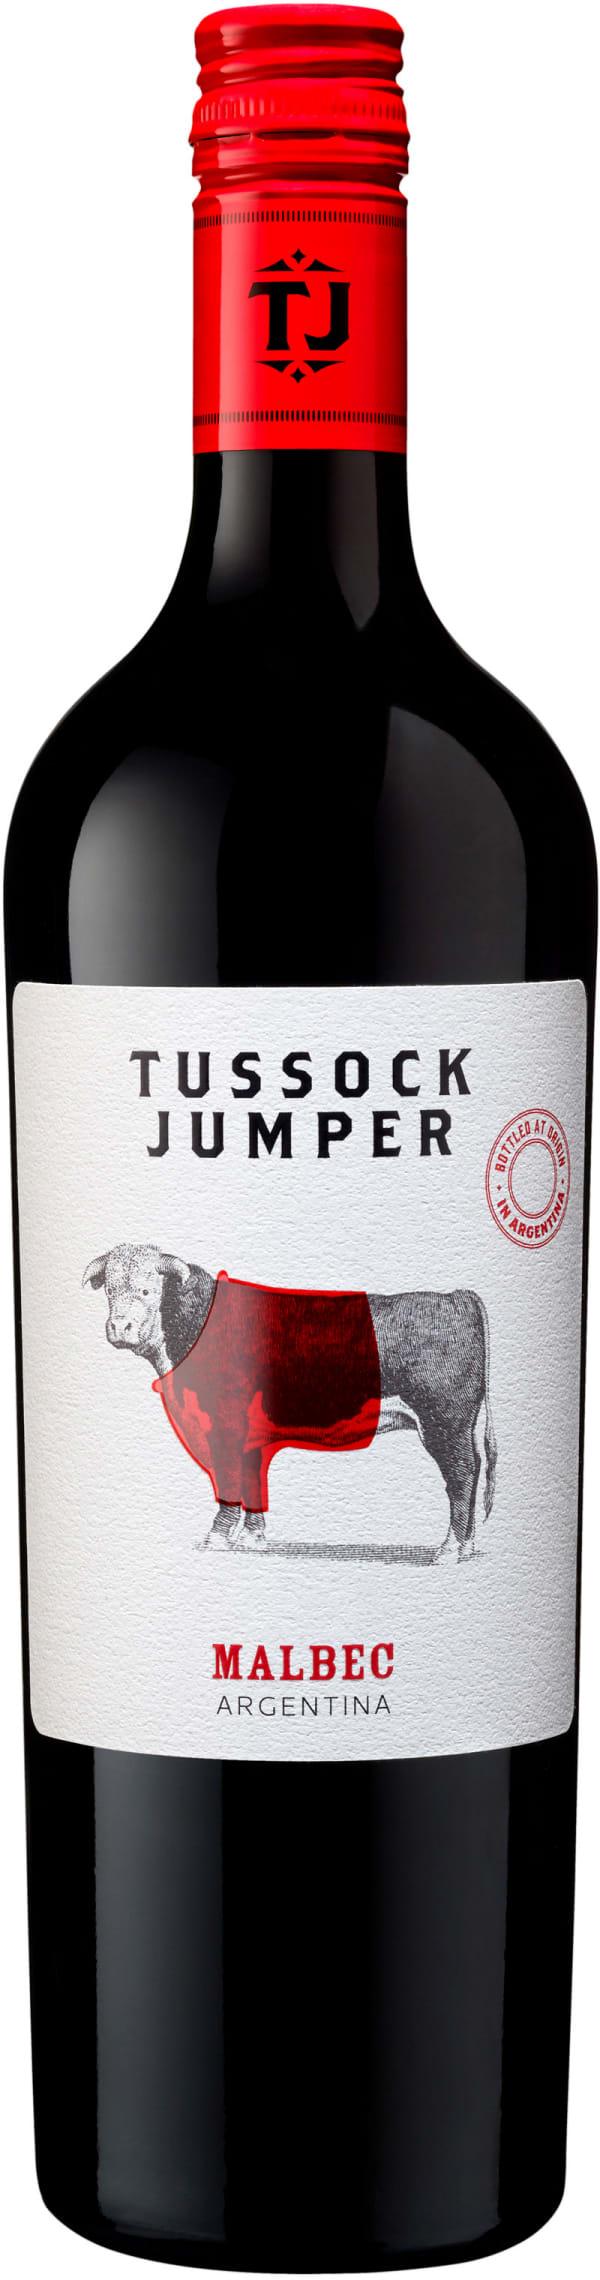 Tussock Jumper Malbec 2017